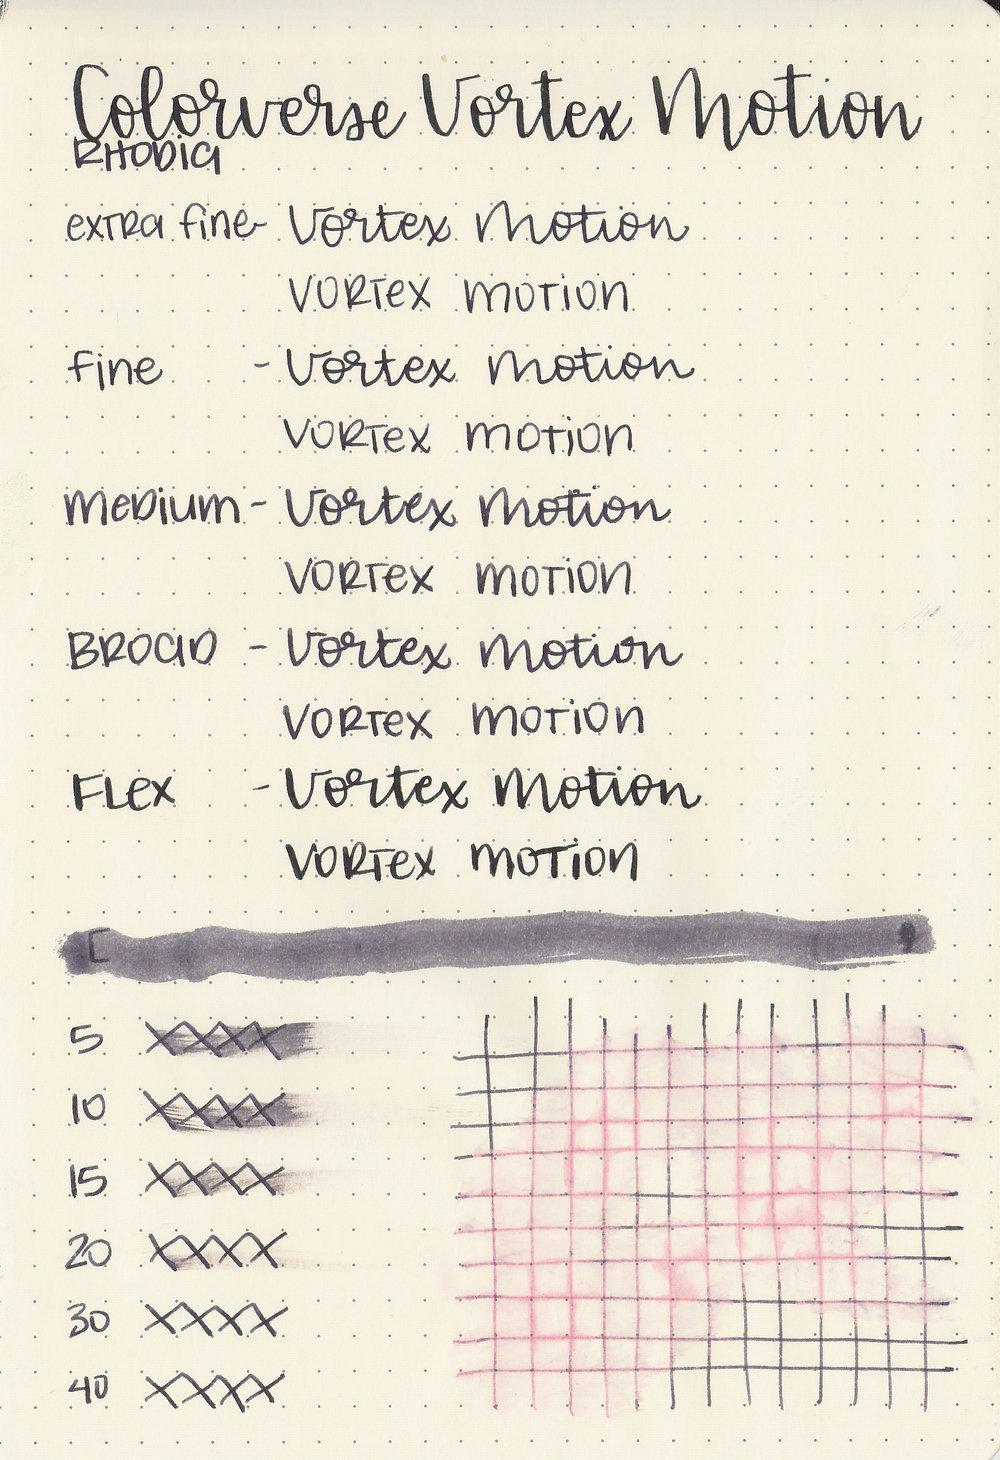 cv-vortex-motion-5.jpg